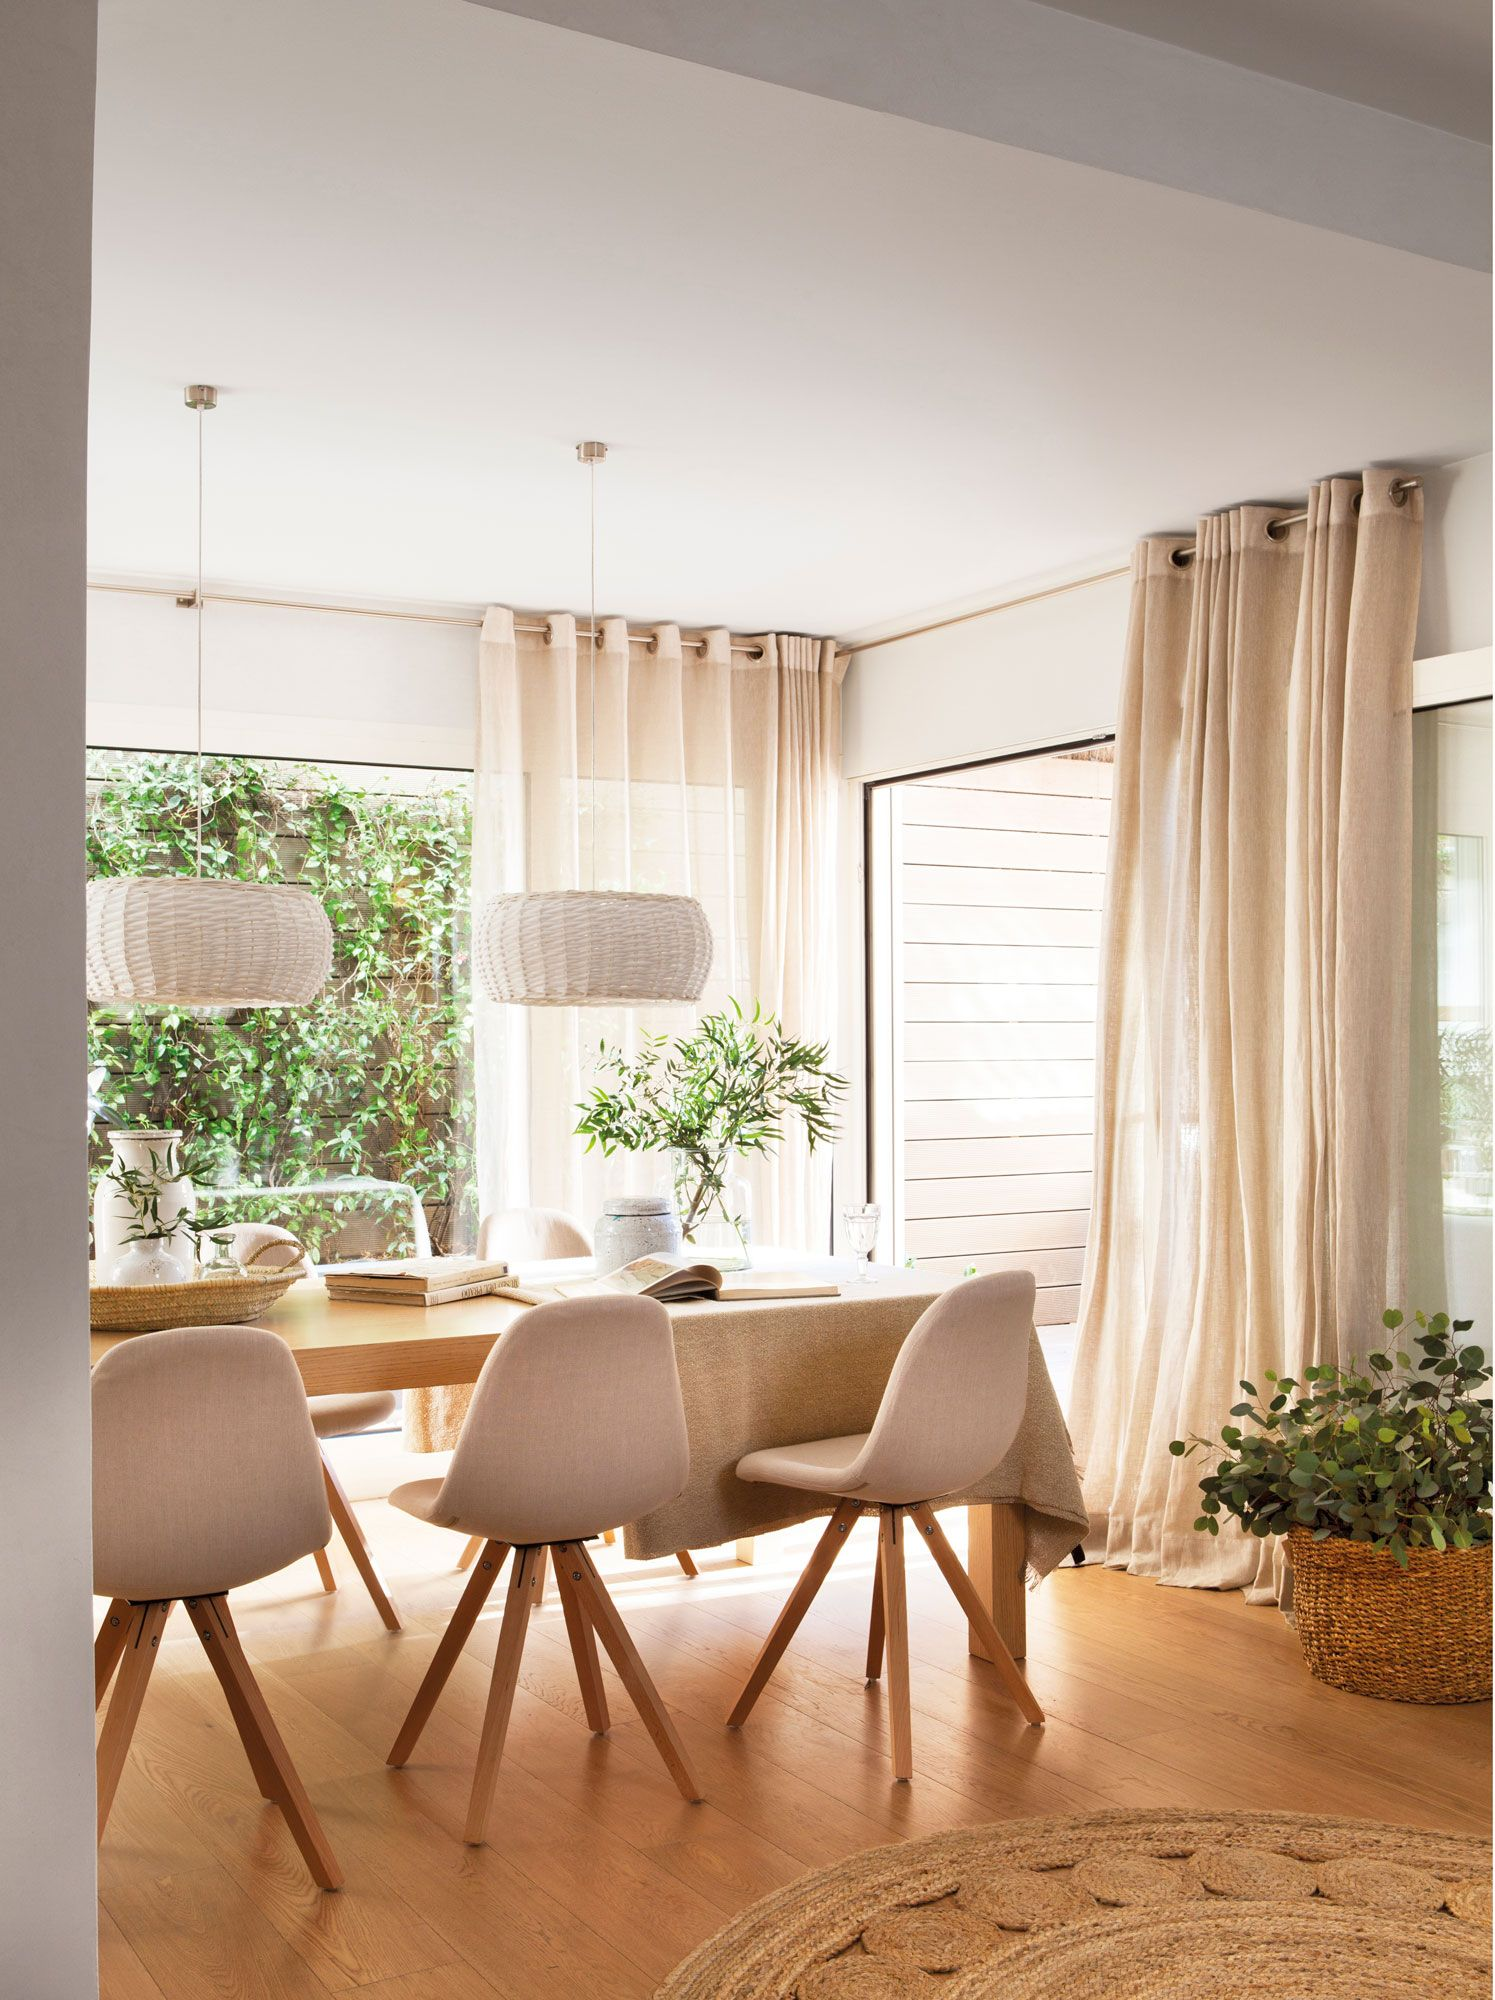 Dónde irán? | DINING | Bedroom decor, Living room decor y Home Decor